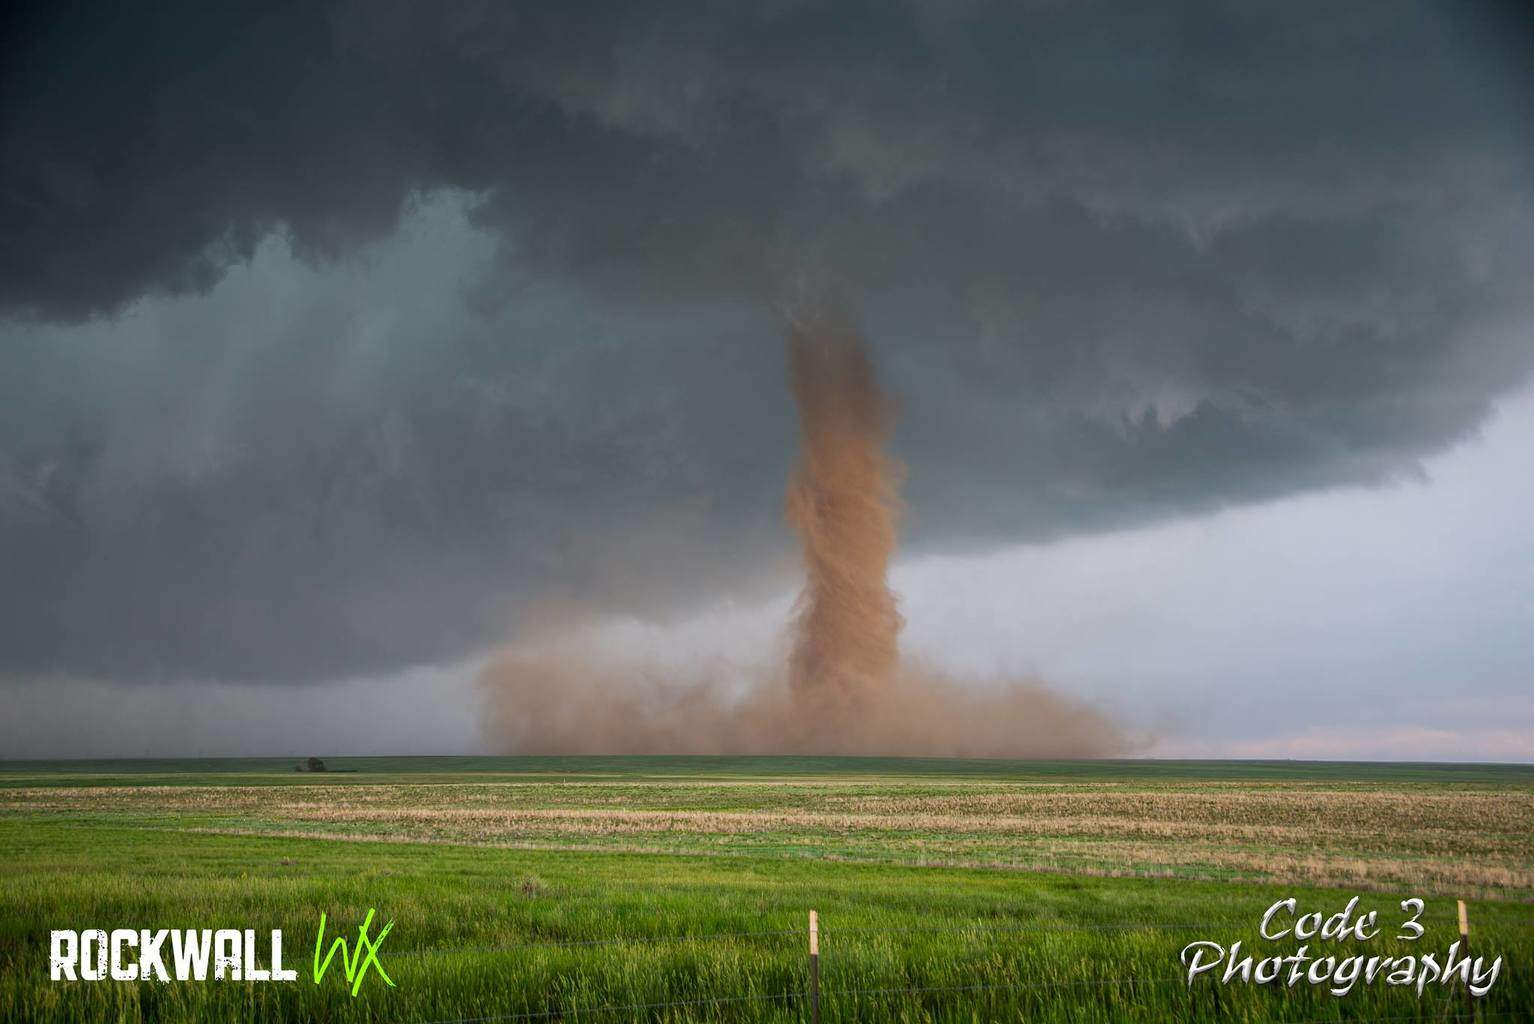 Beautiful Anticyclonic Tornado near Simla, Co on 6-4-15. — with Joseph Barton Comstock.